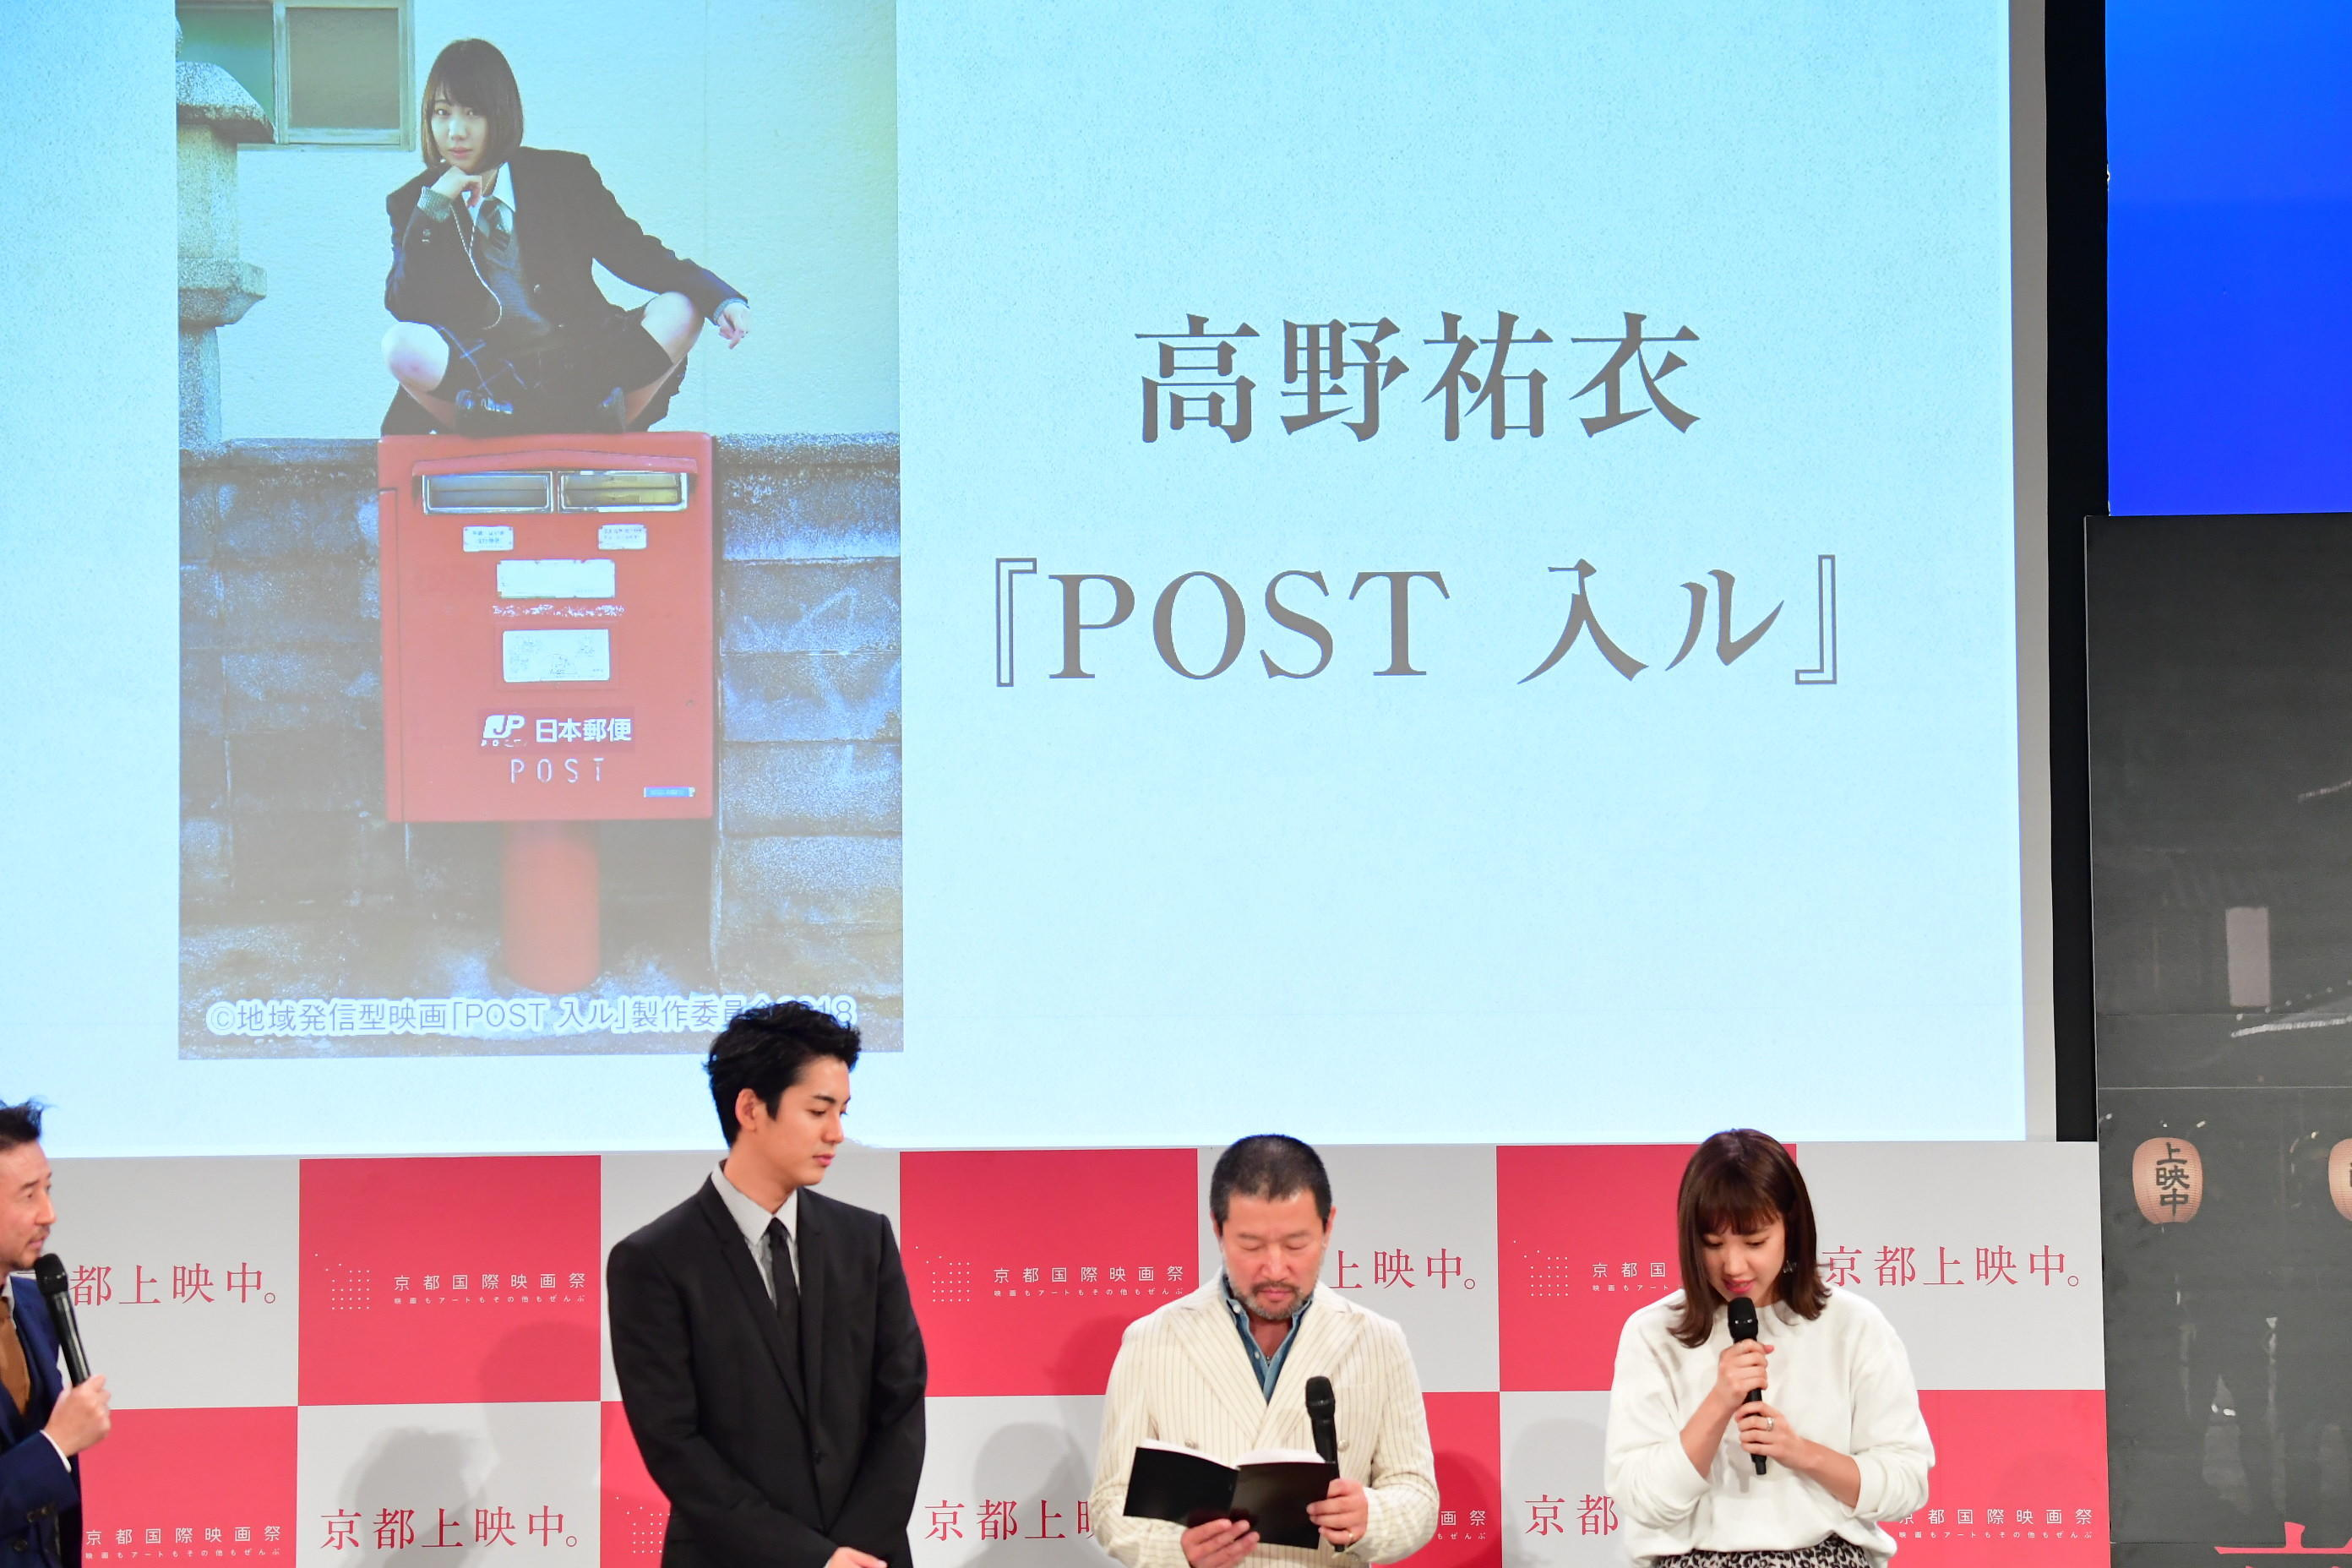 http://news.yoshimoto.co.jp/20180903233542-cf649ae9e5be72ff199fd4b94b58b95add62be15.jpg